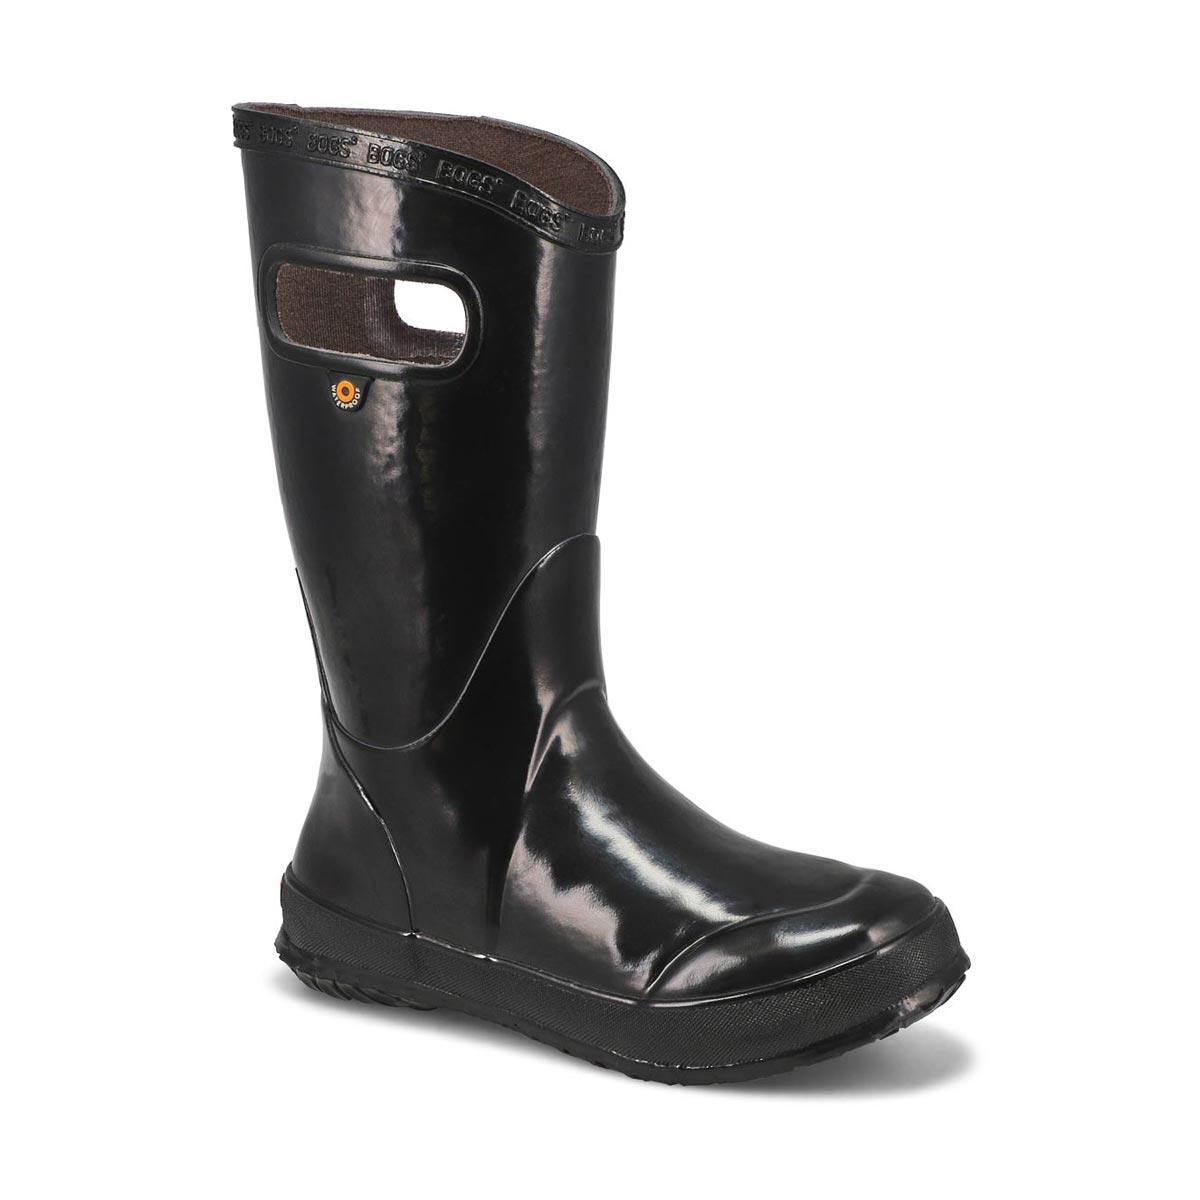 Kids' RAIN BOOT SOLID black rain boots